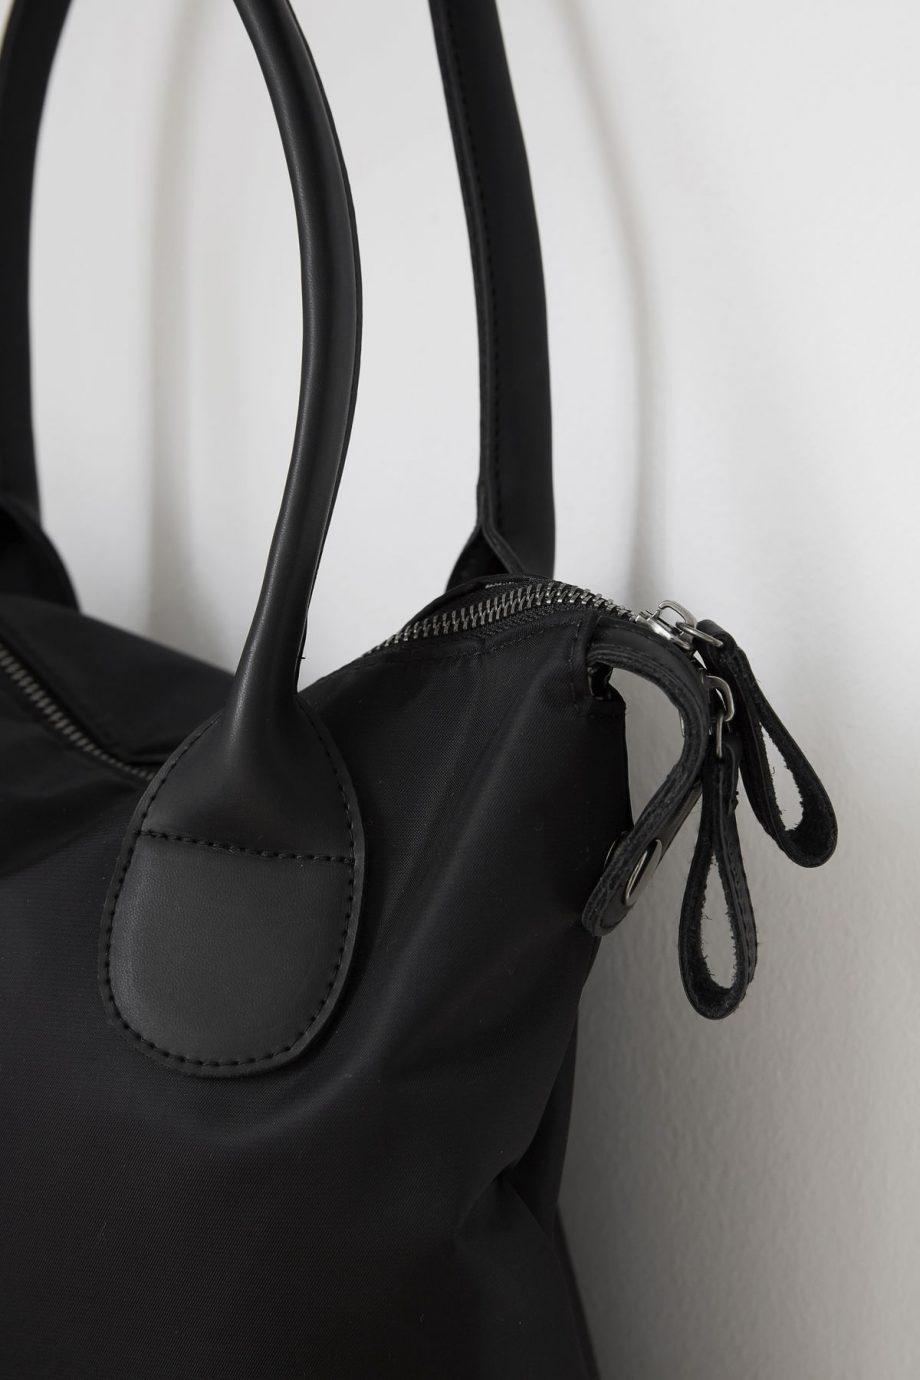 web1800 white cg0801 03 920x1380 - Travel bag - Svart